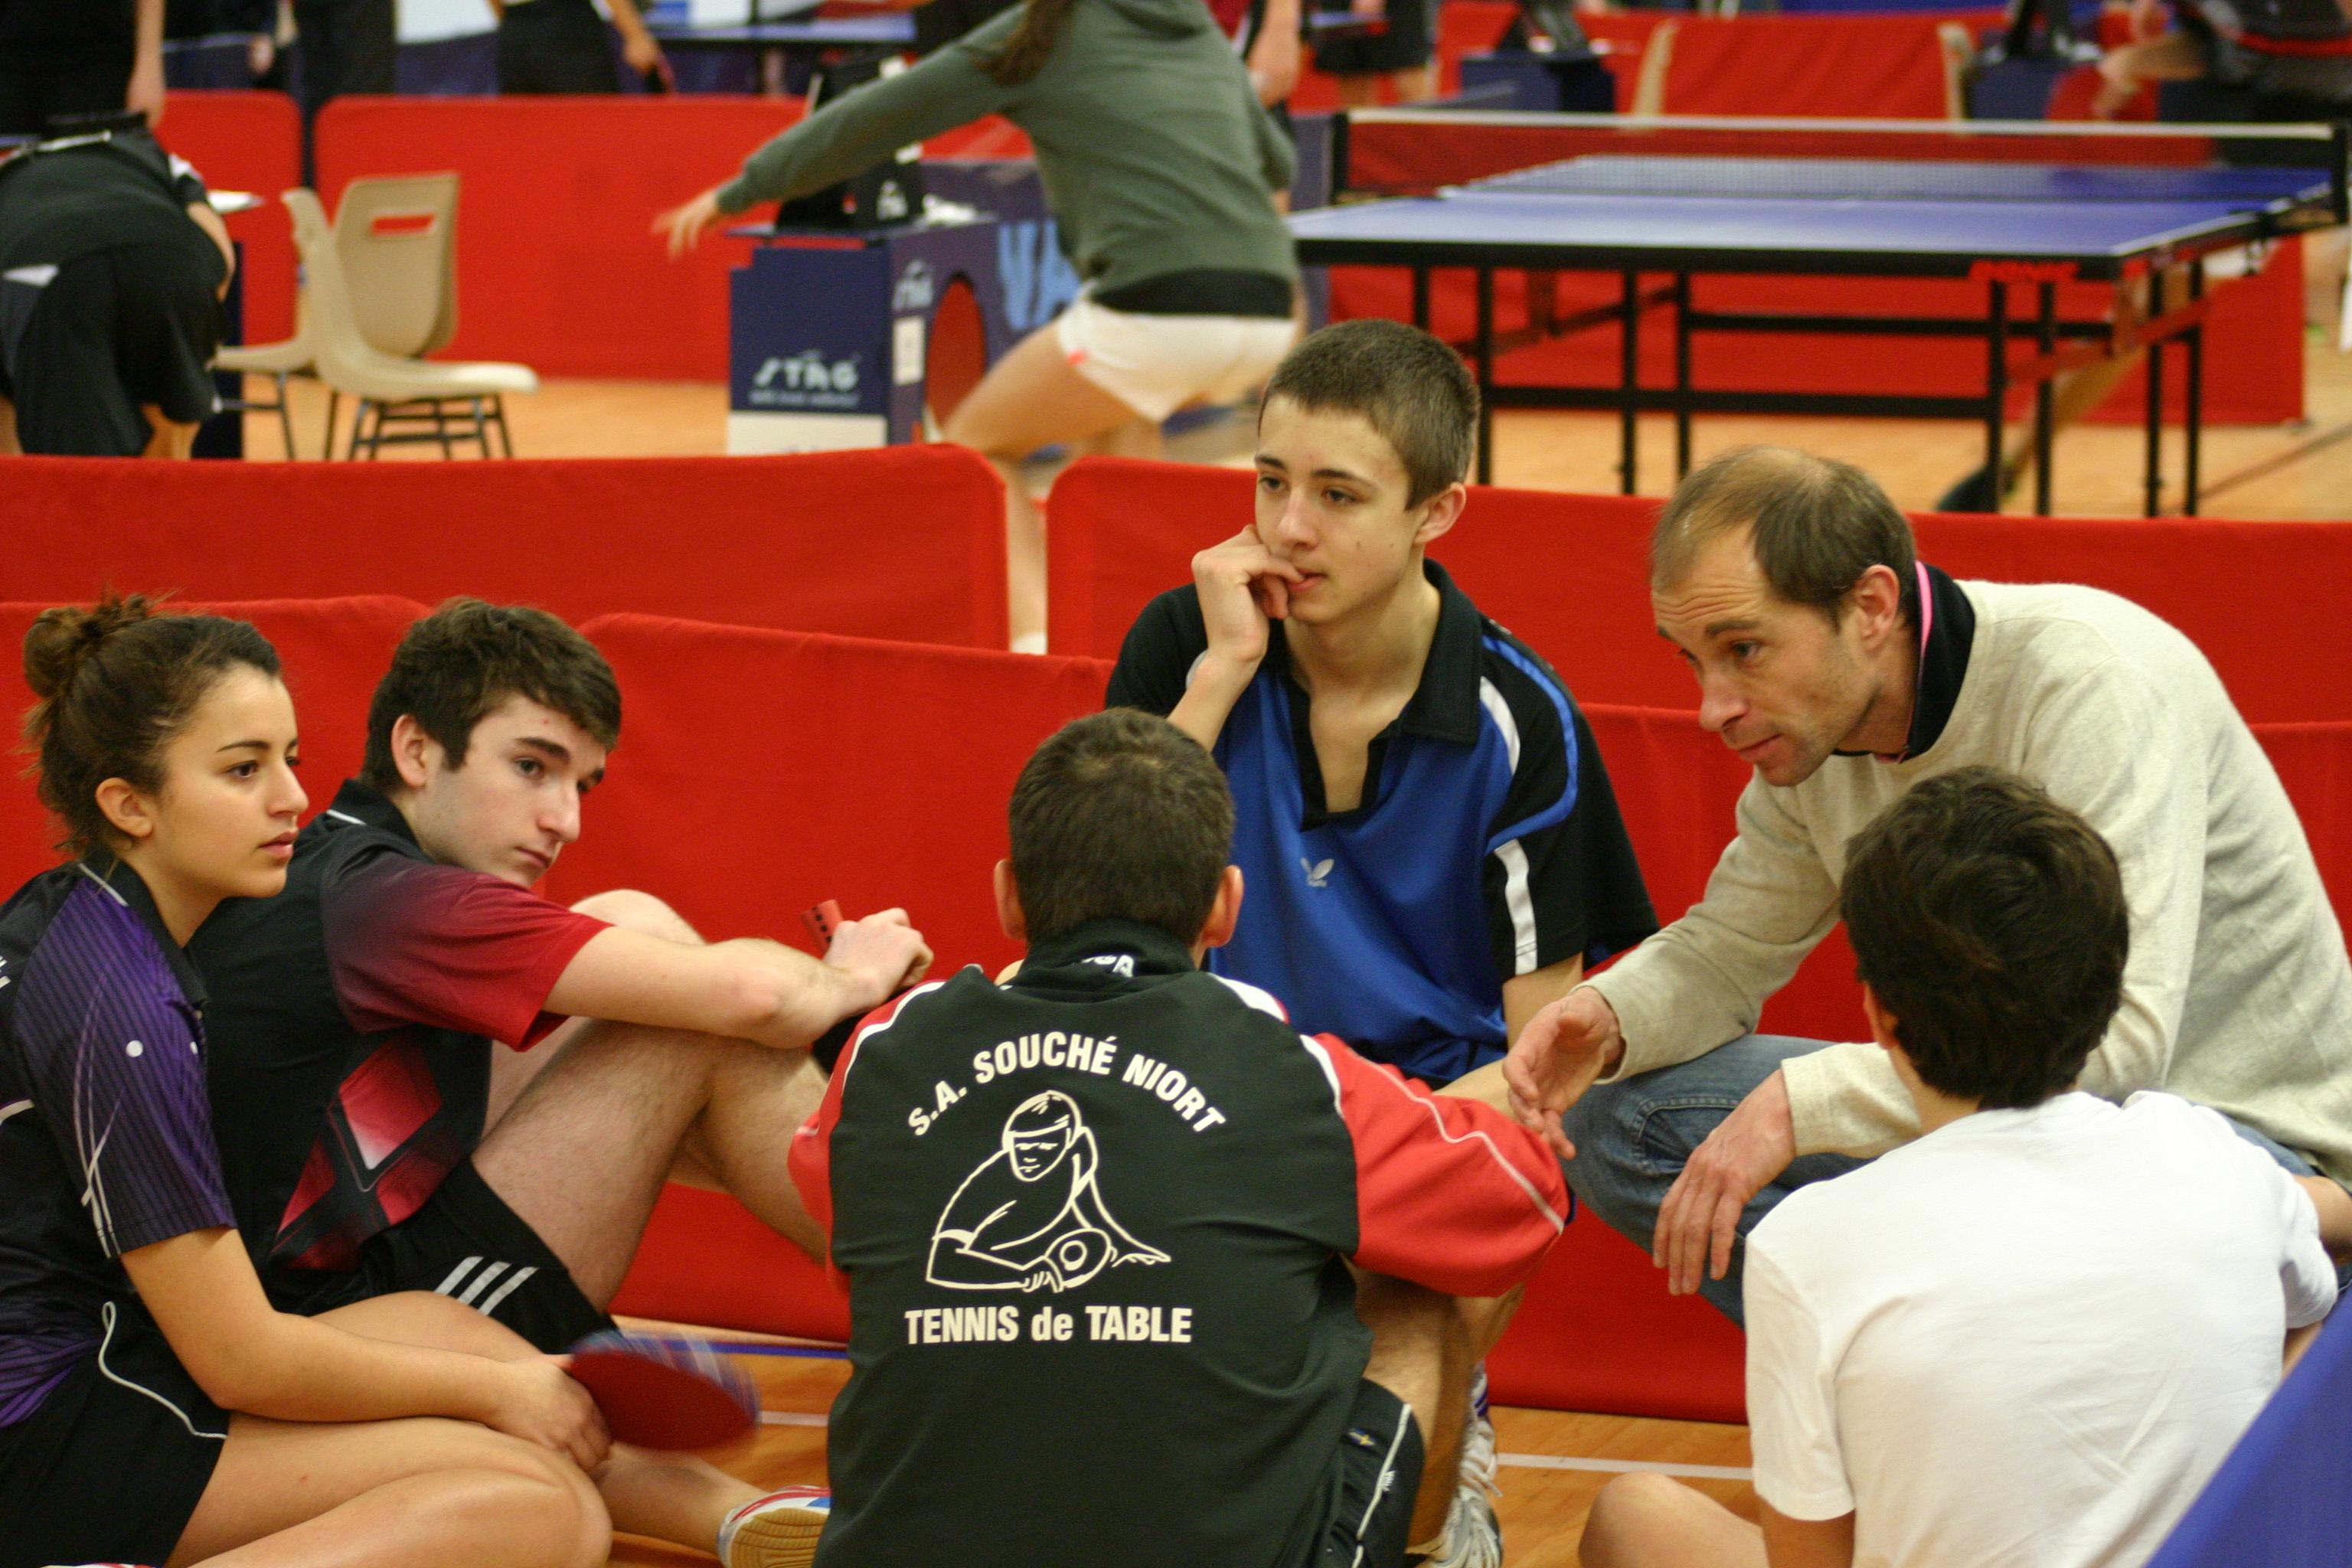 Tennis de table le lyc e paul guerin vice champion de france unss 2014 lyc e paul gu rin - Champion de france tennis de table ...